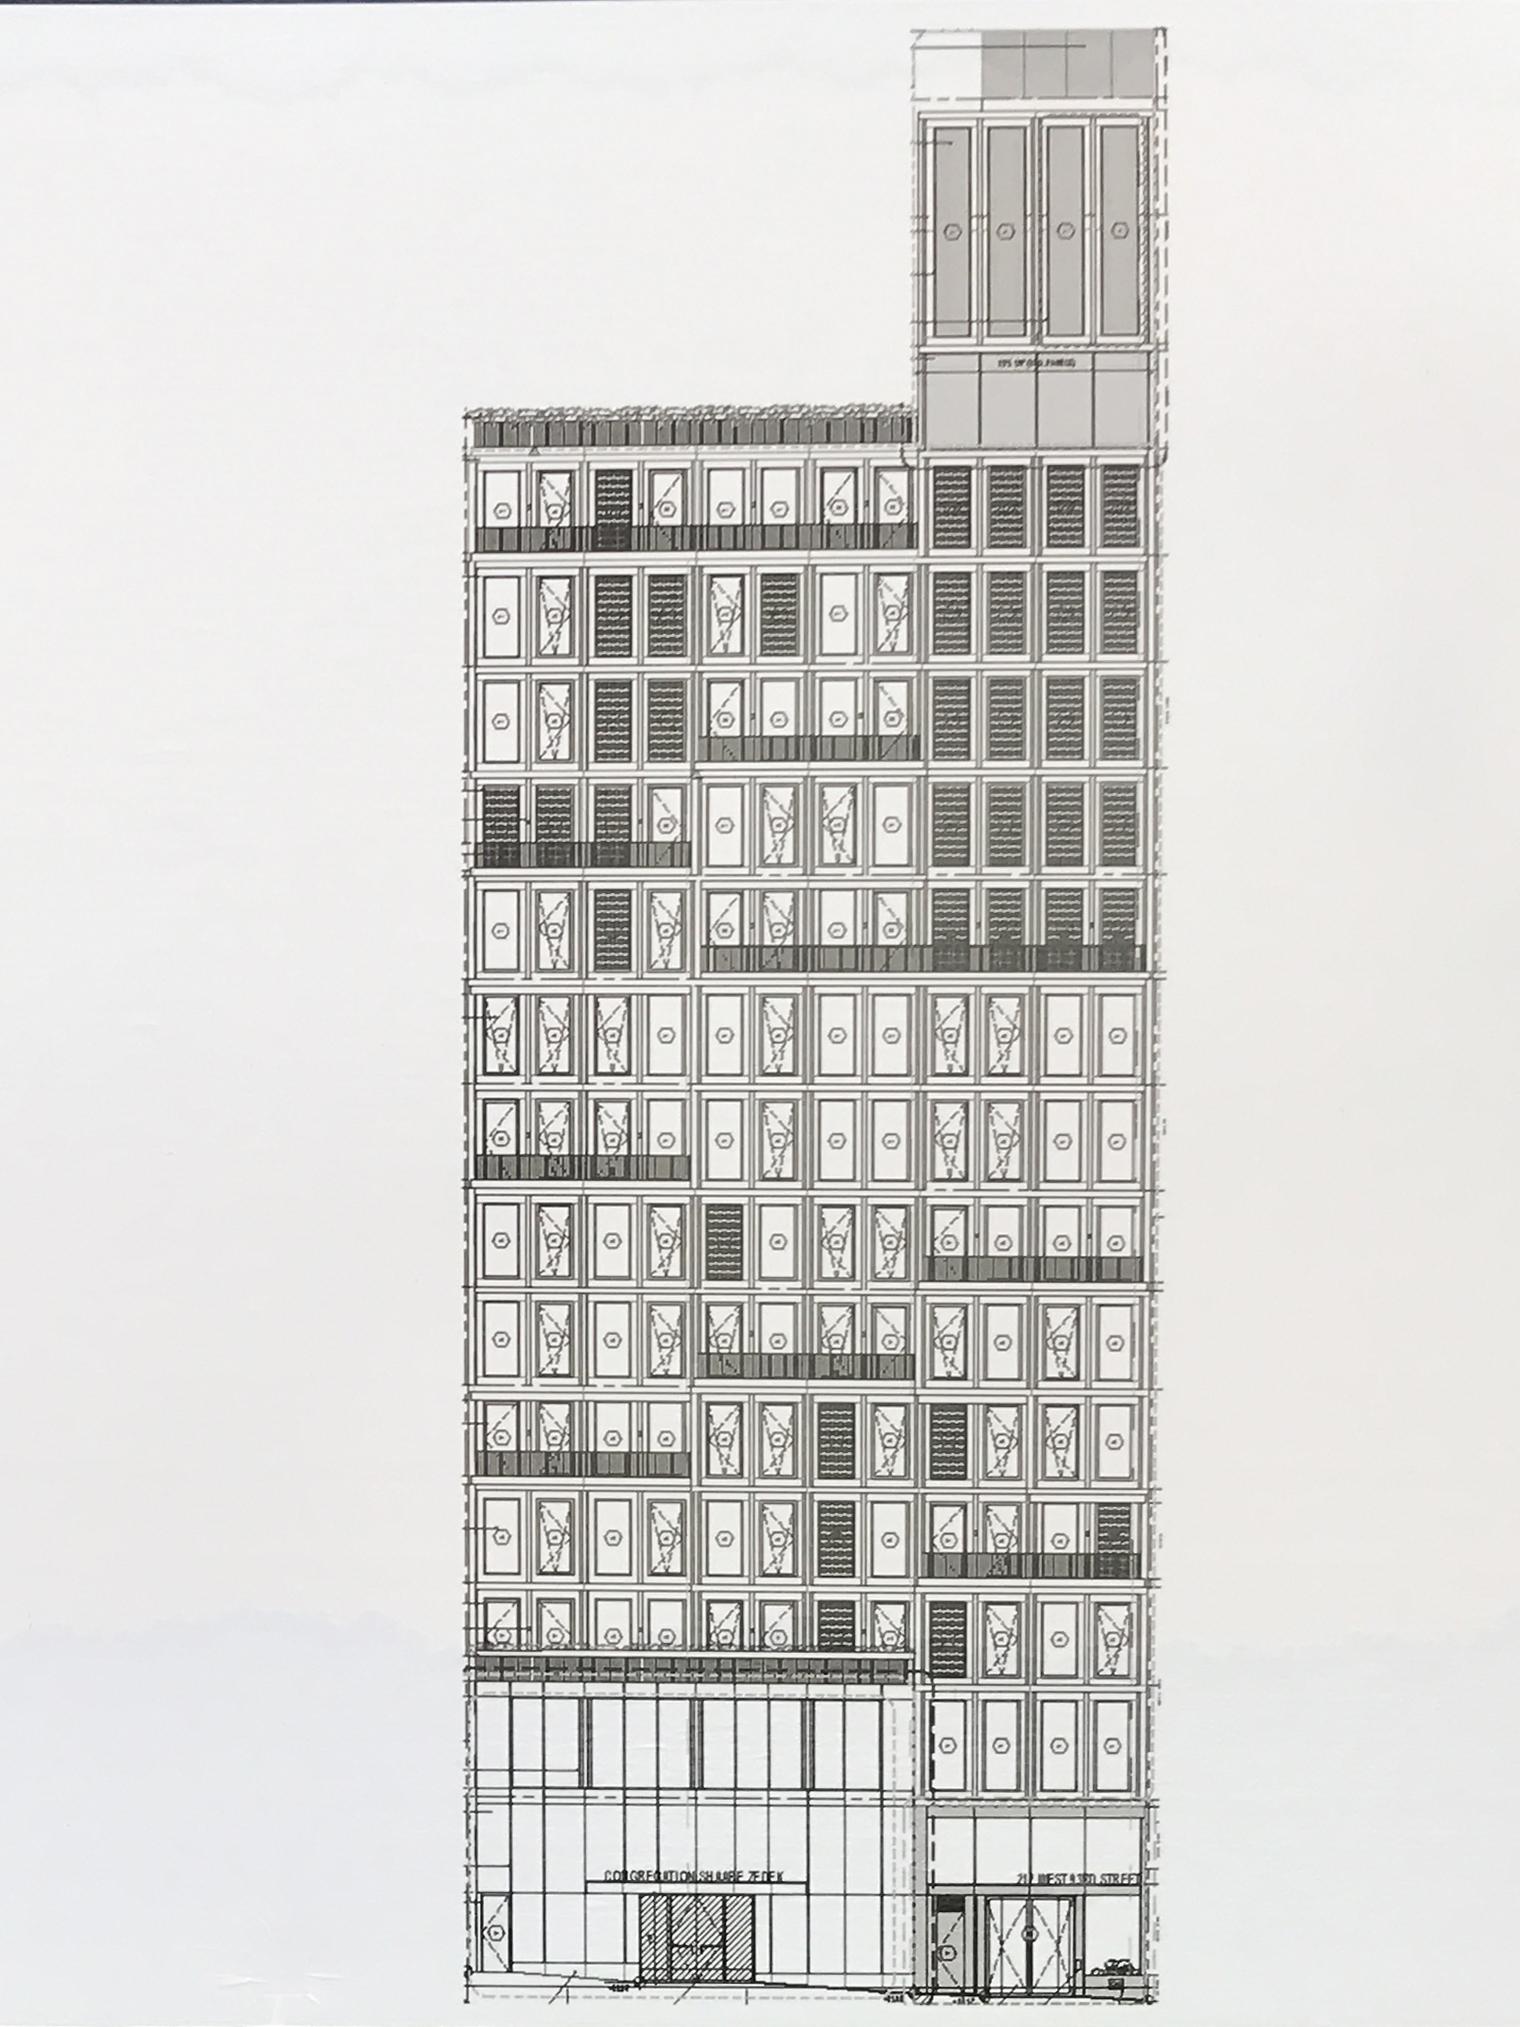 212 West 93rd Street Nyc Condo Apartments Cityrealty